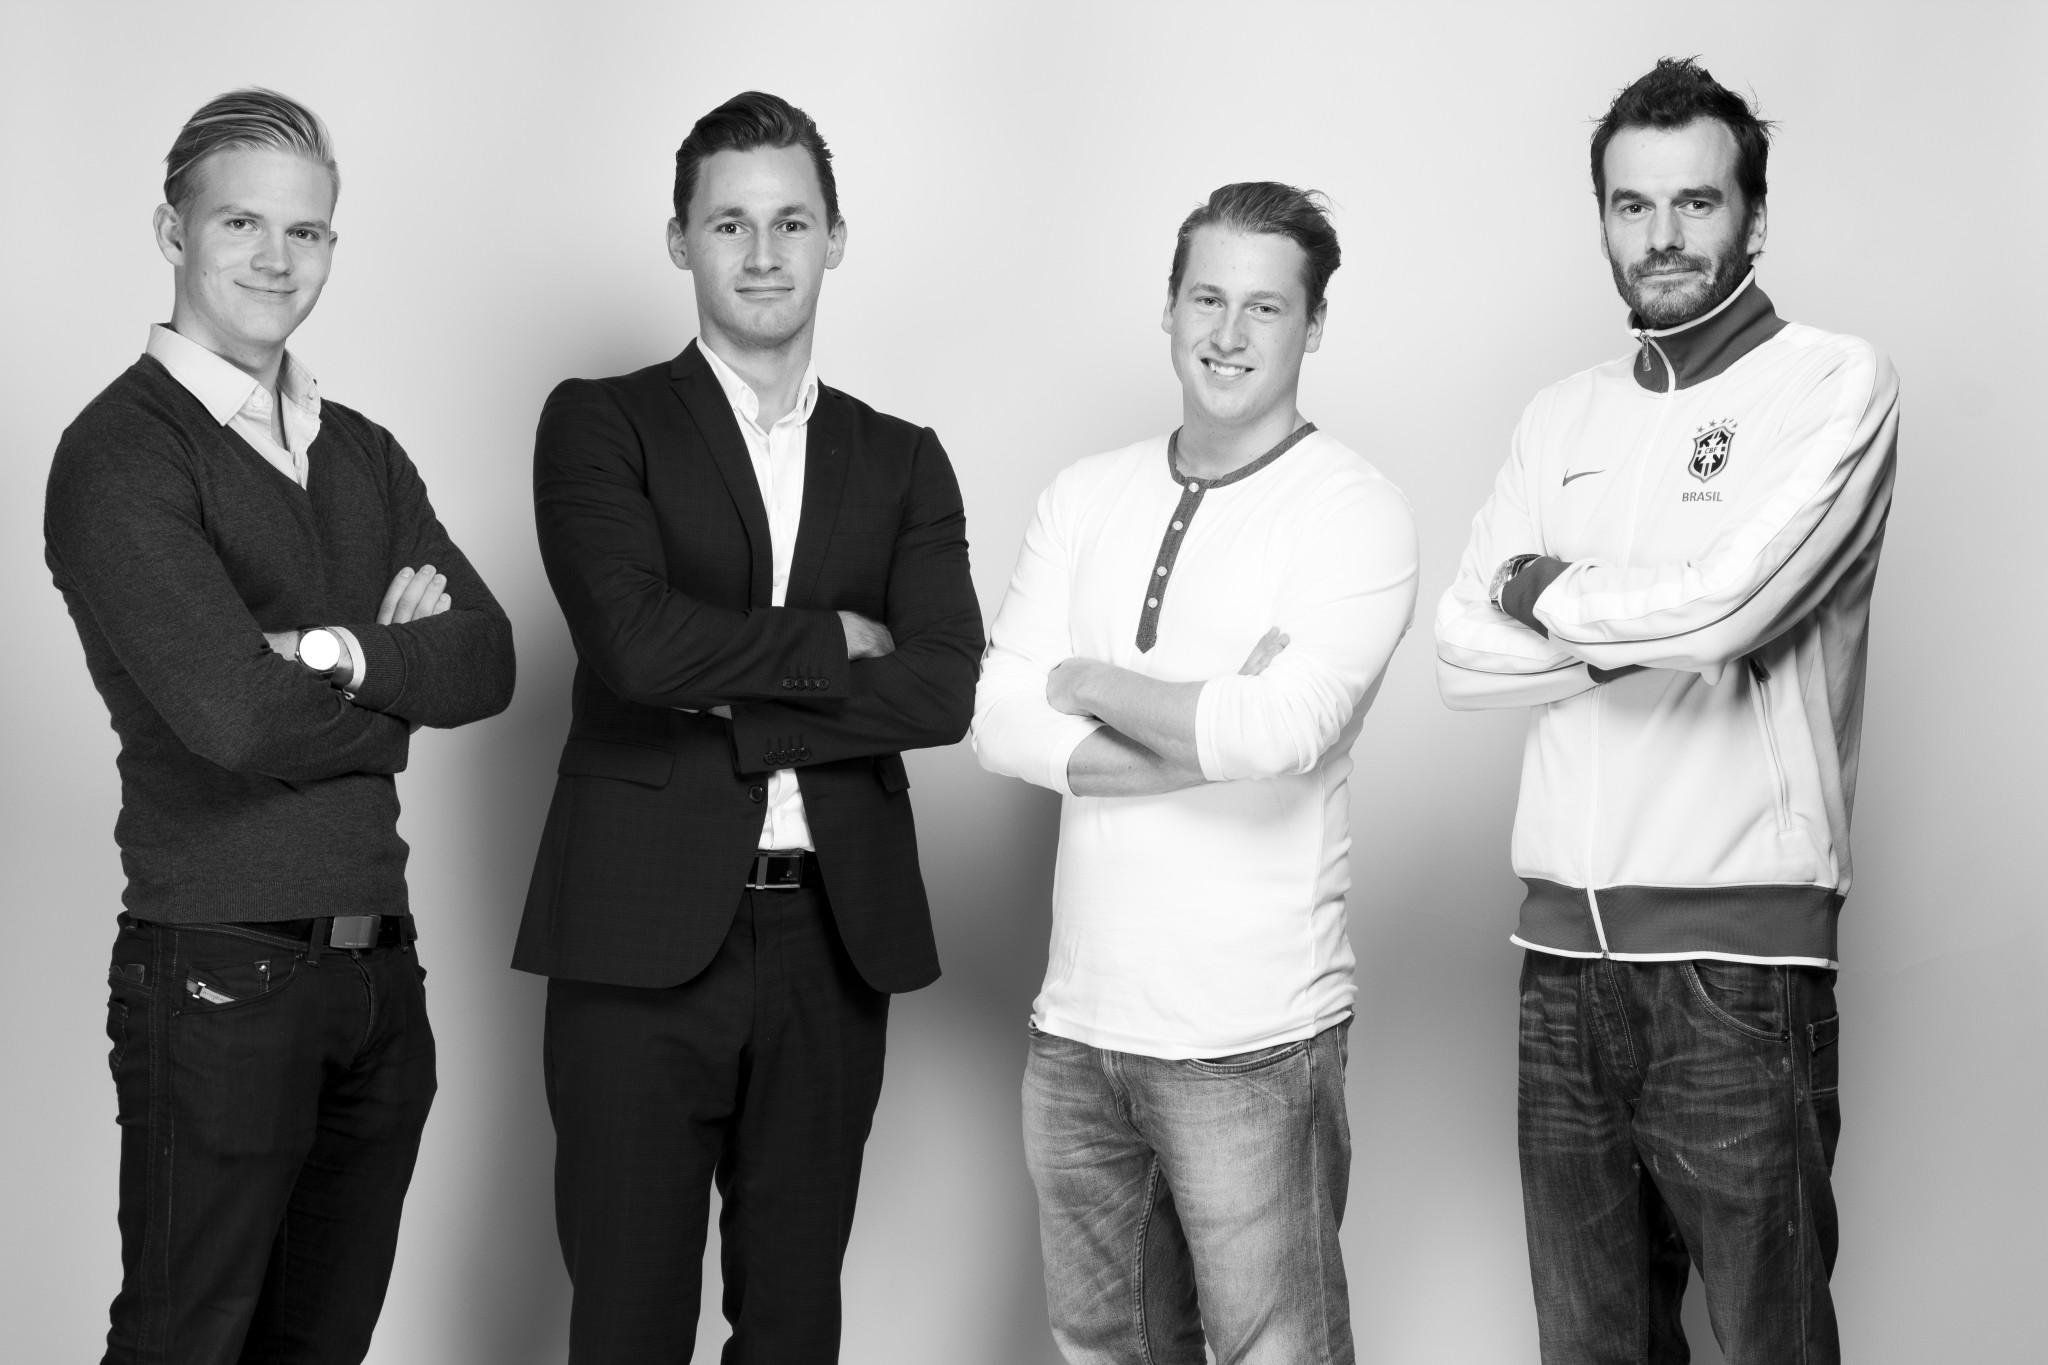 Drinkster, Drinkster.dk, Mads Lund, Jesper Buch